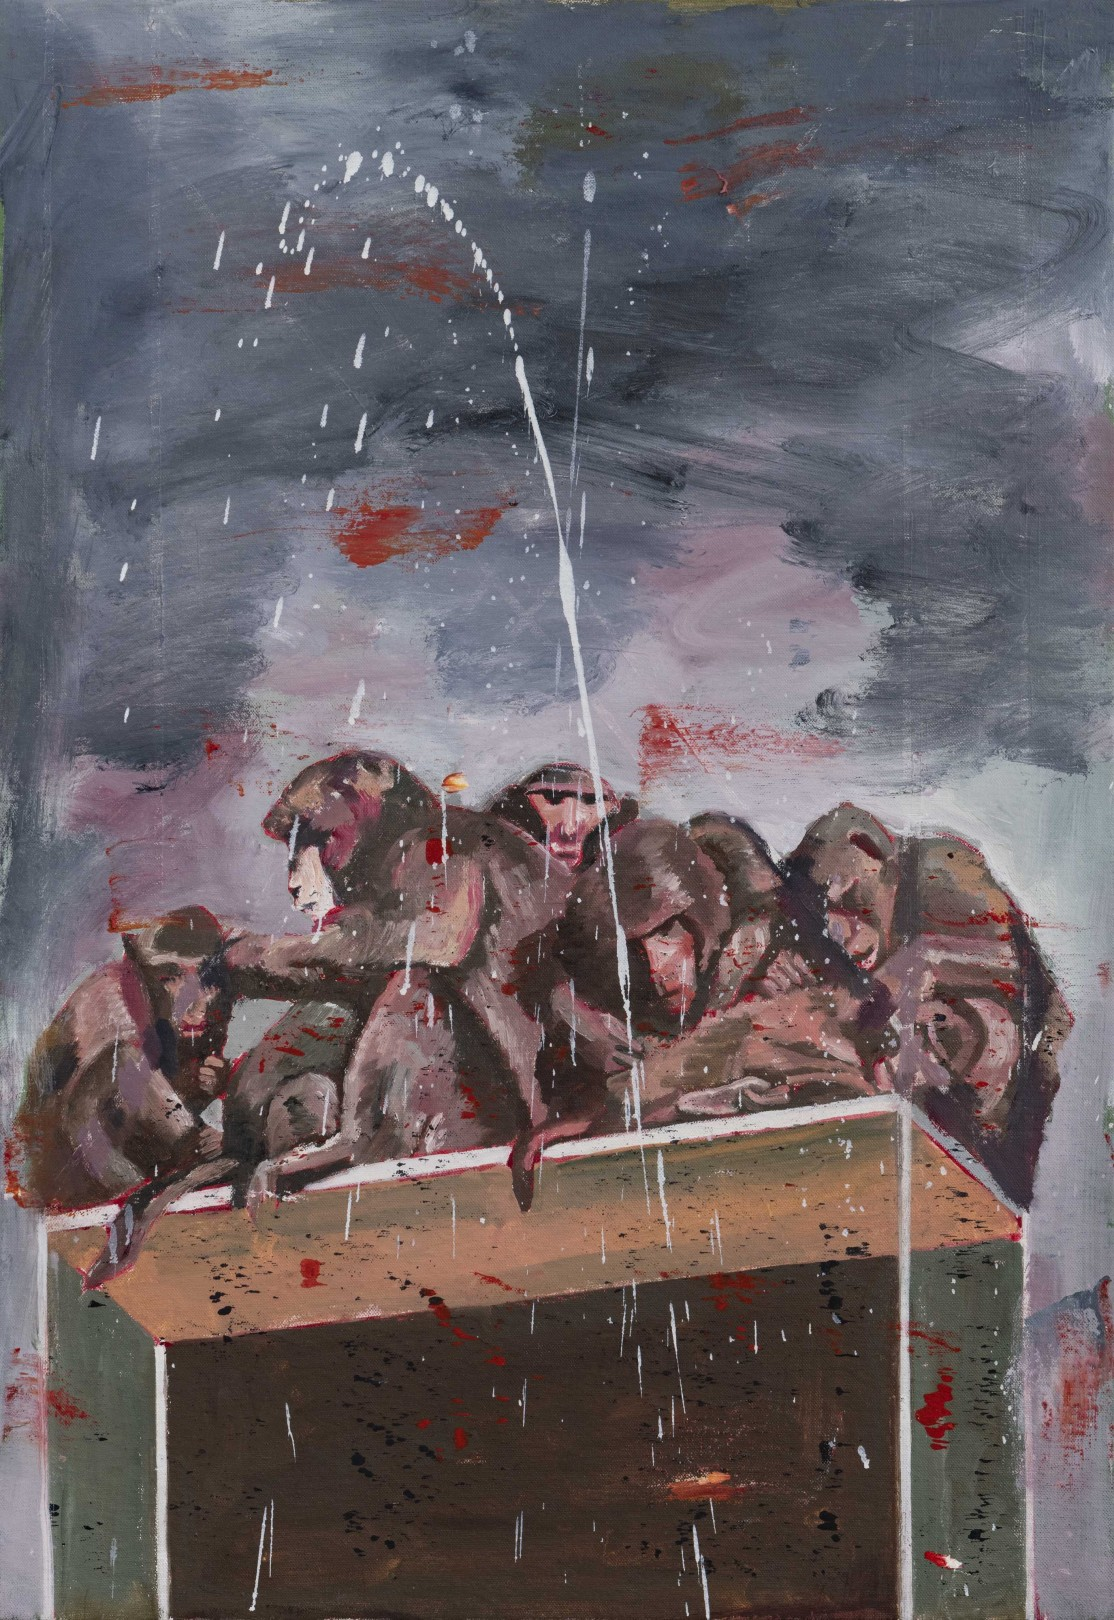 Nicky Nodjoumi Gathering, 2019 Oil on canvas 66 x 46 cm. / 26 x 18 in.